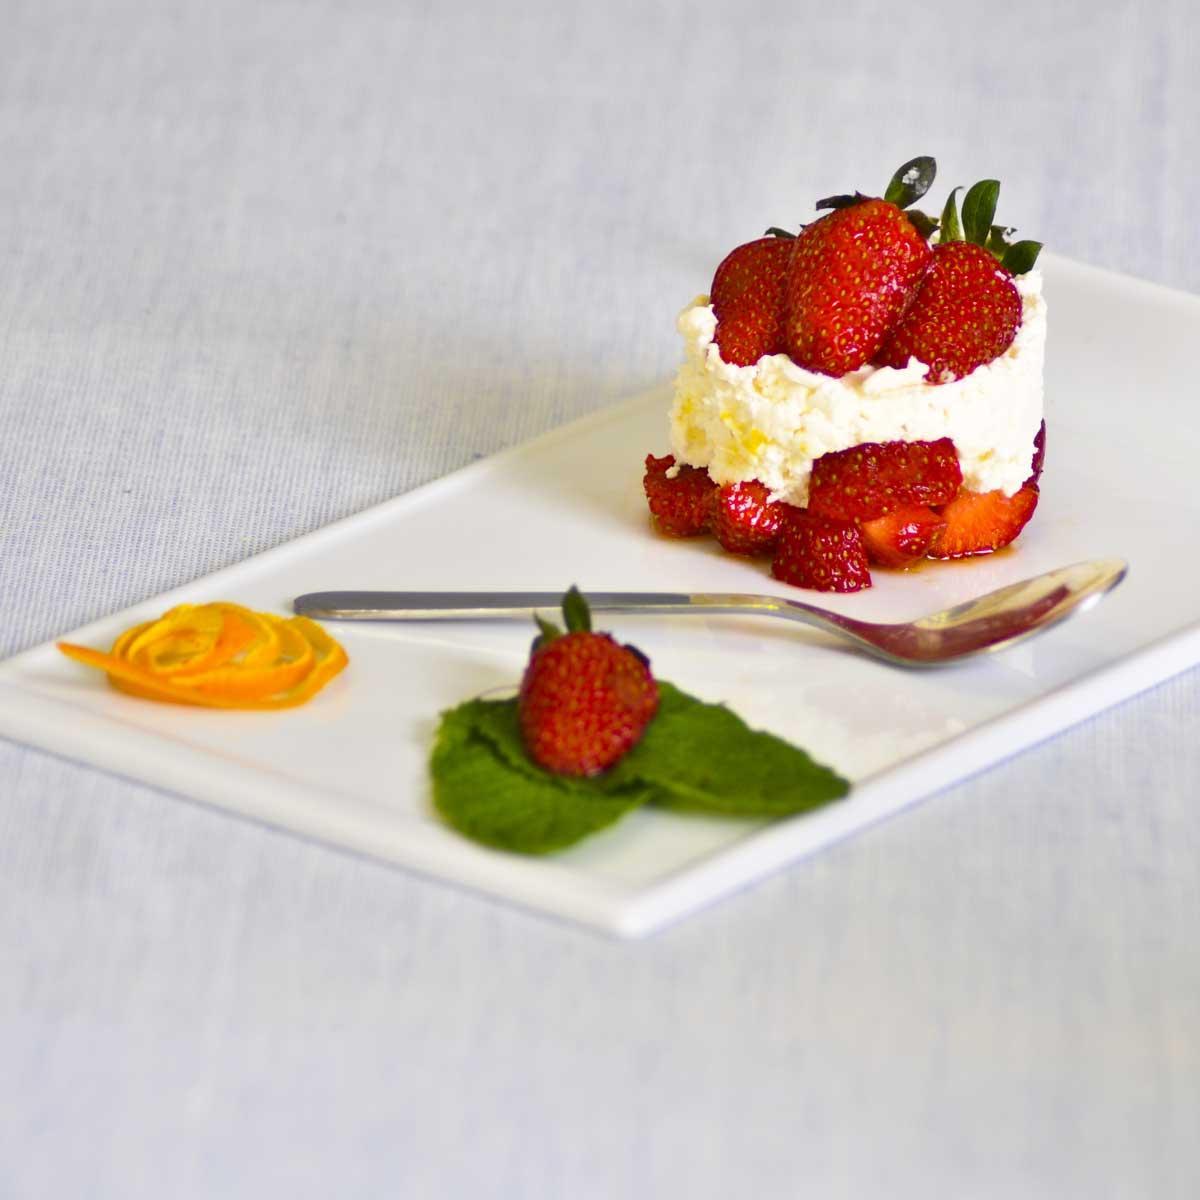 Recette fraises au mascarpone cuisine madame figaro - Cuisine au mascarpone ...